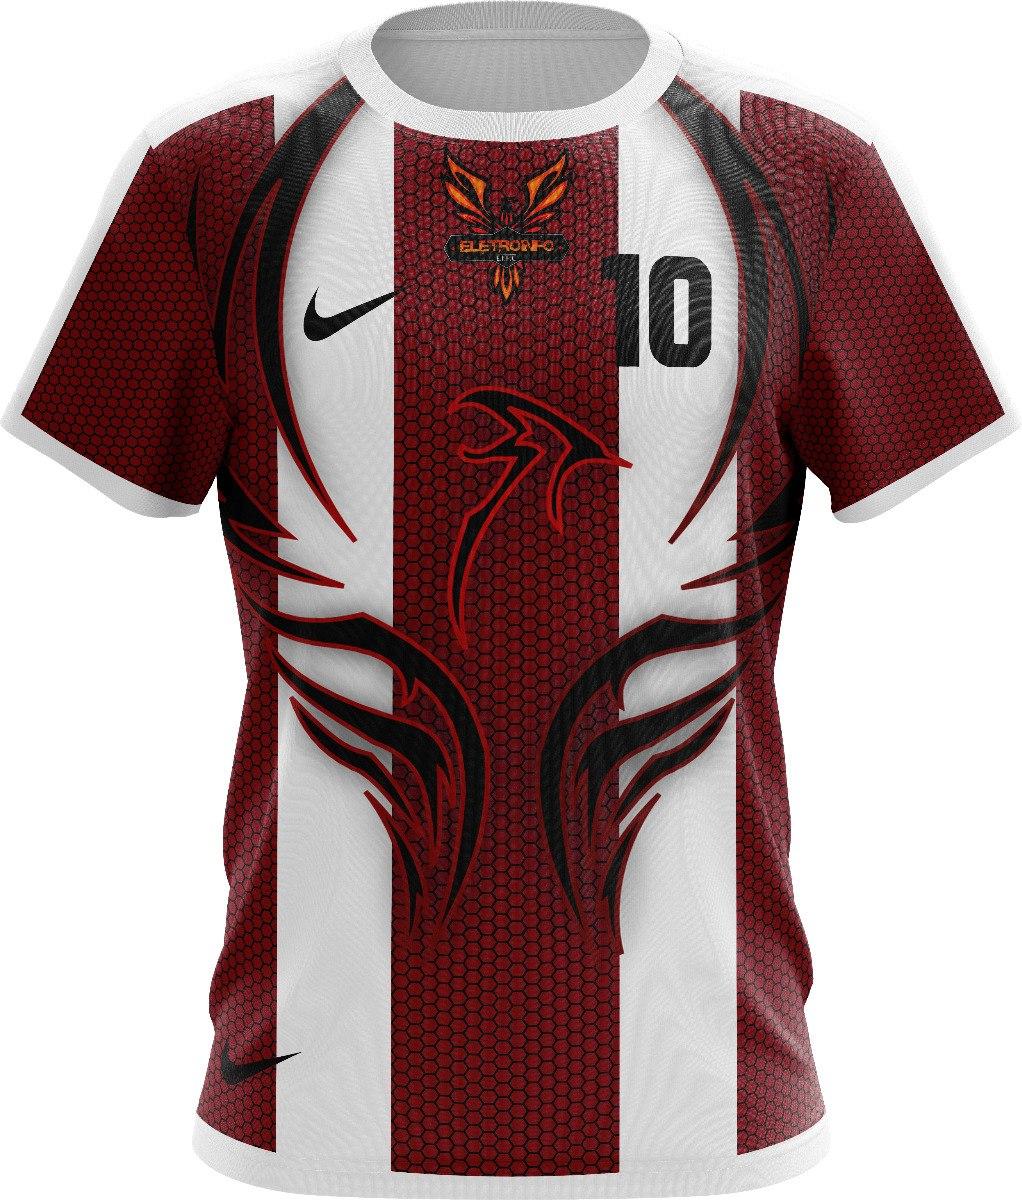 kit uniforme camisa d futebol personalizado dryfit malhafria. Carregando  zoom. 72d5f13c049a5